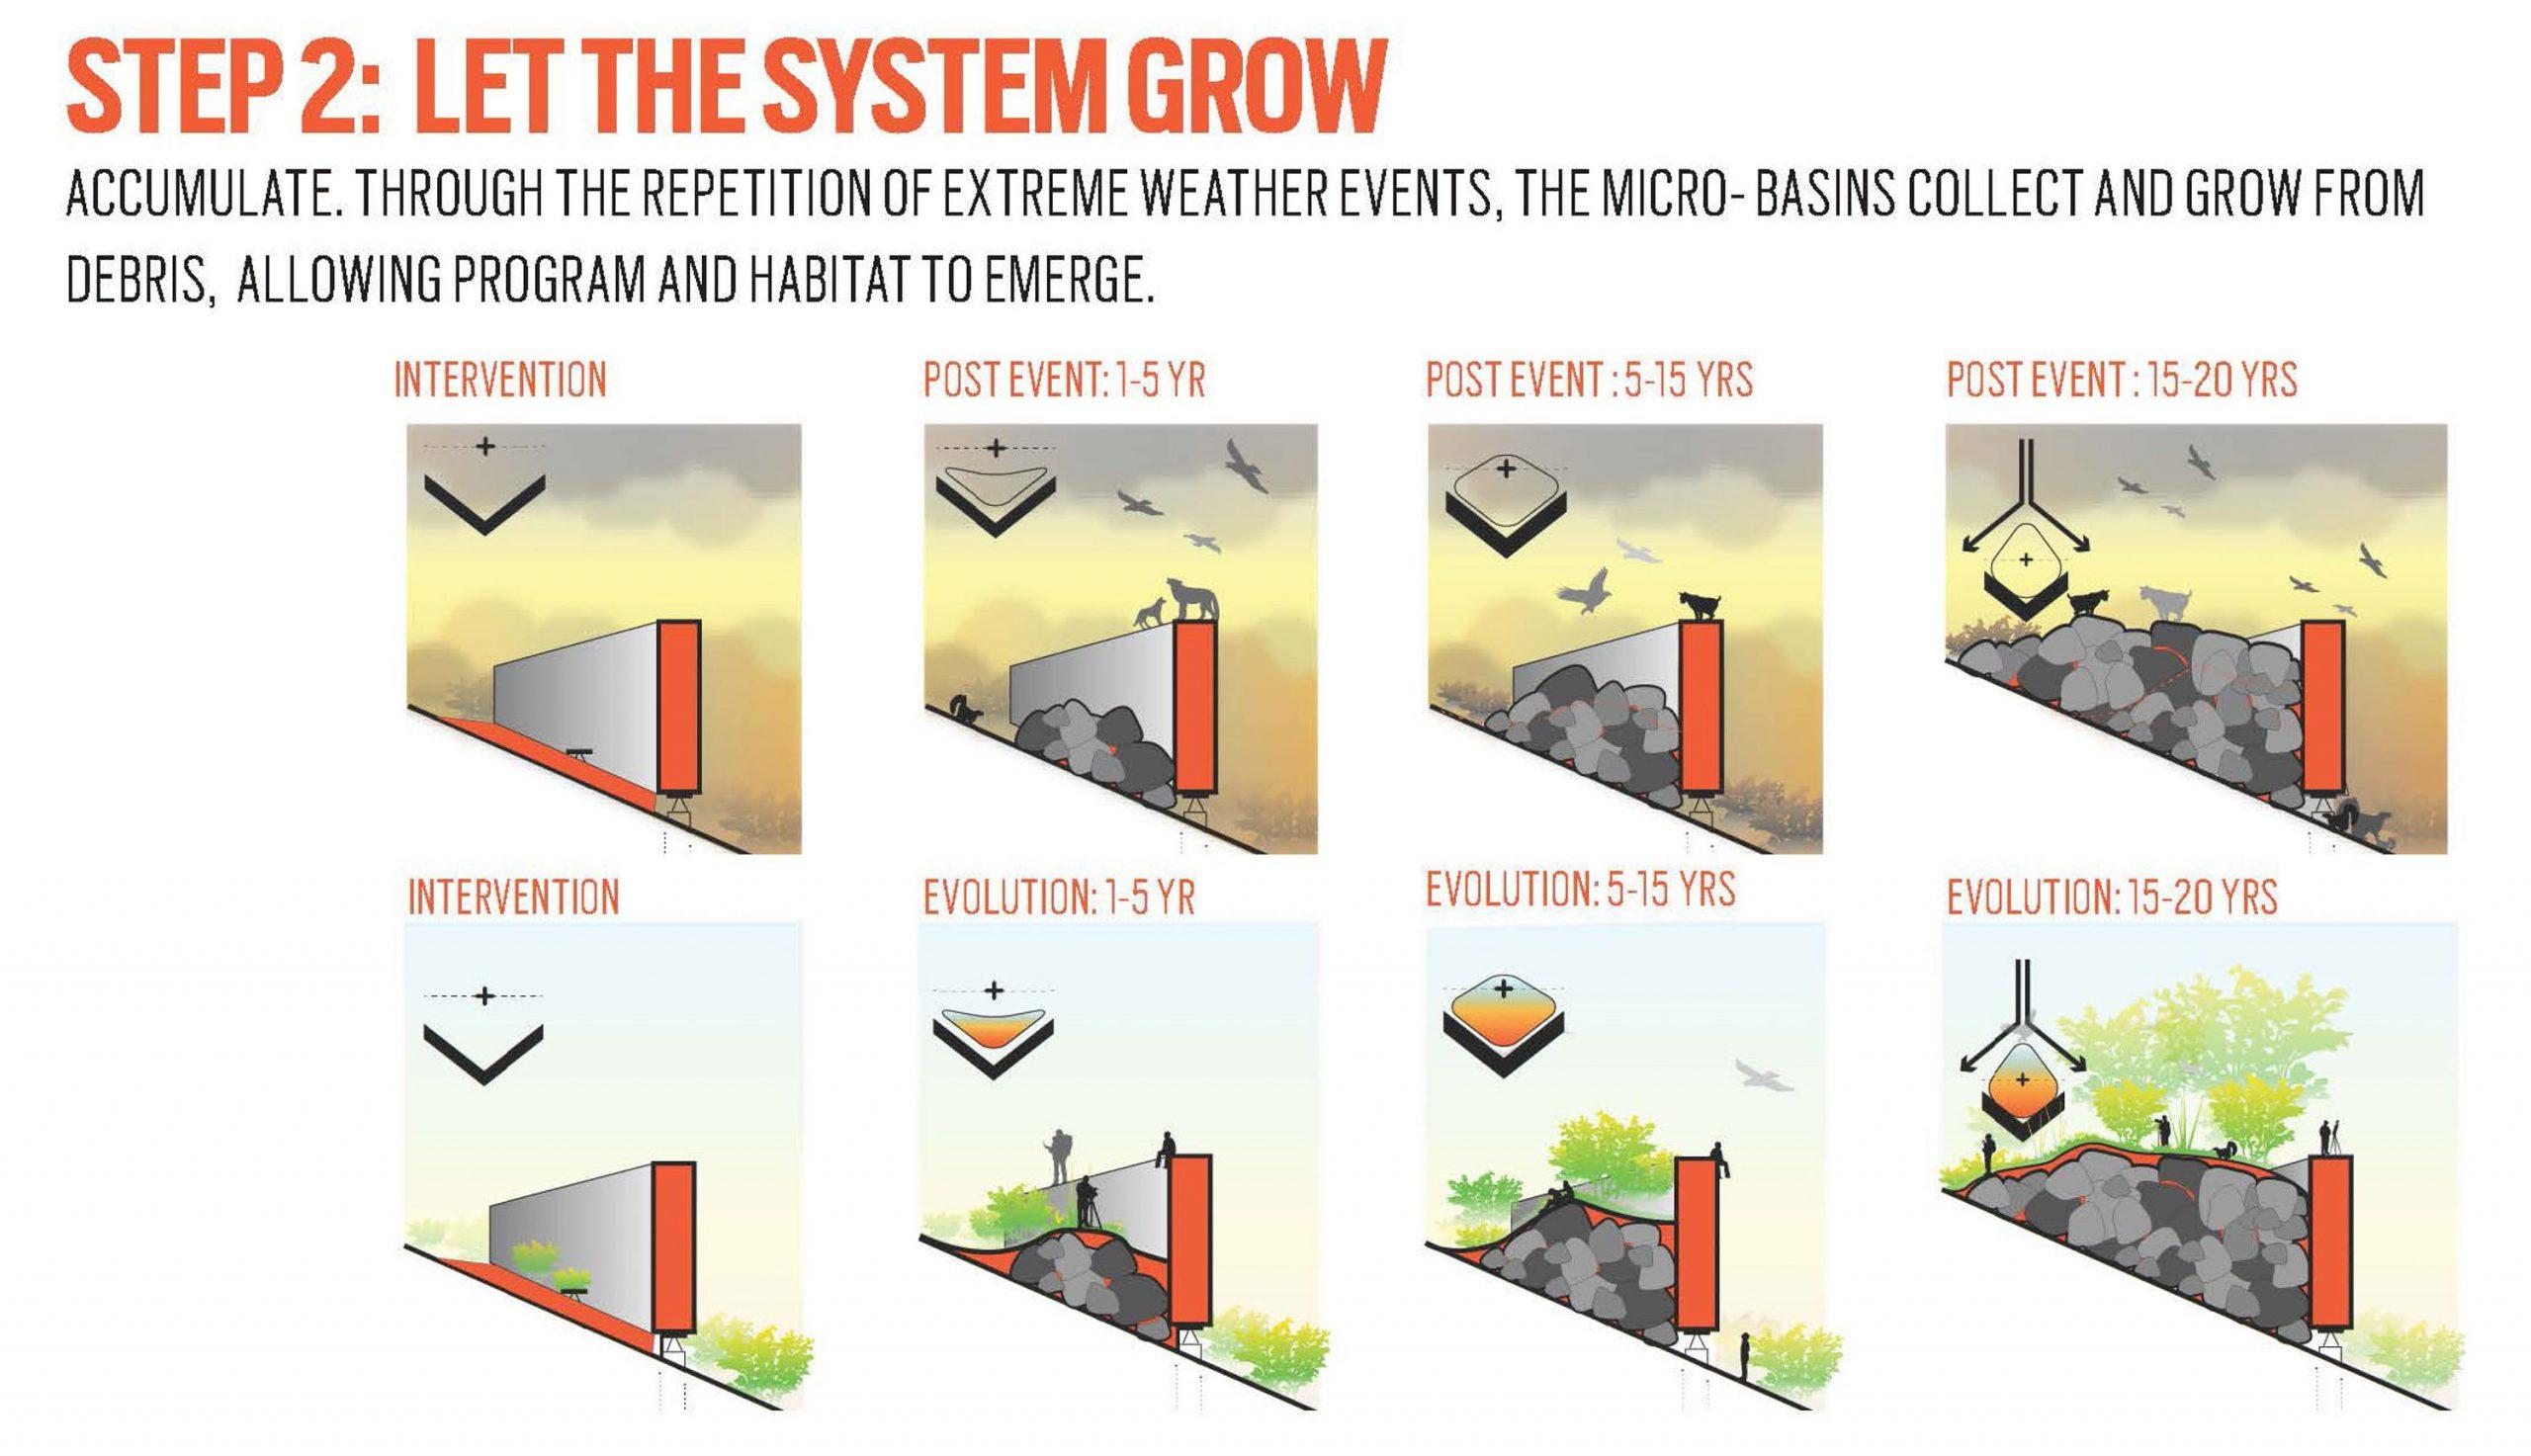 System growth diagram